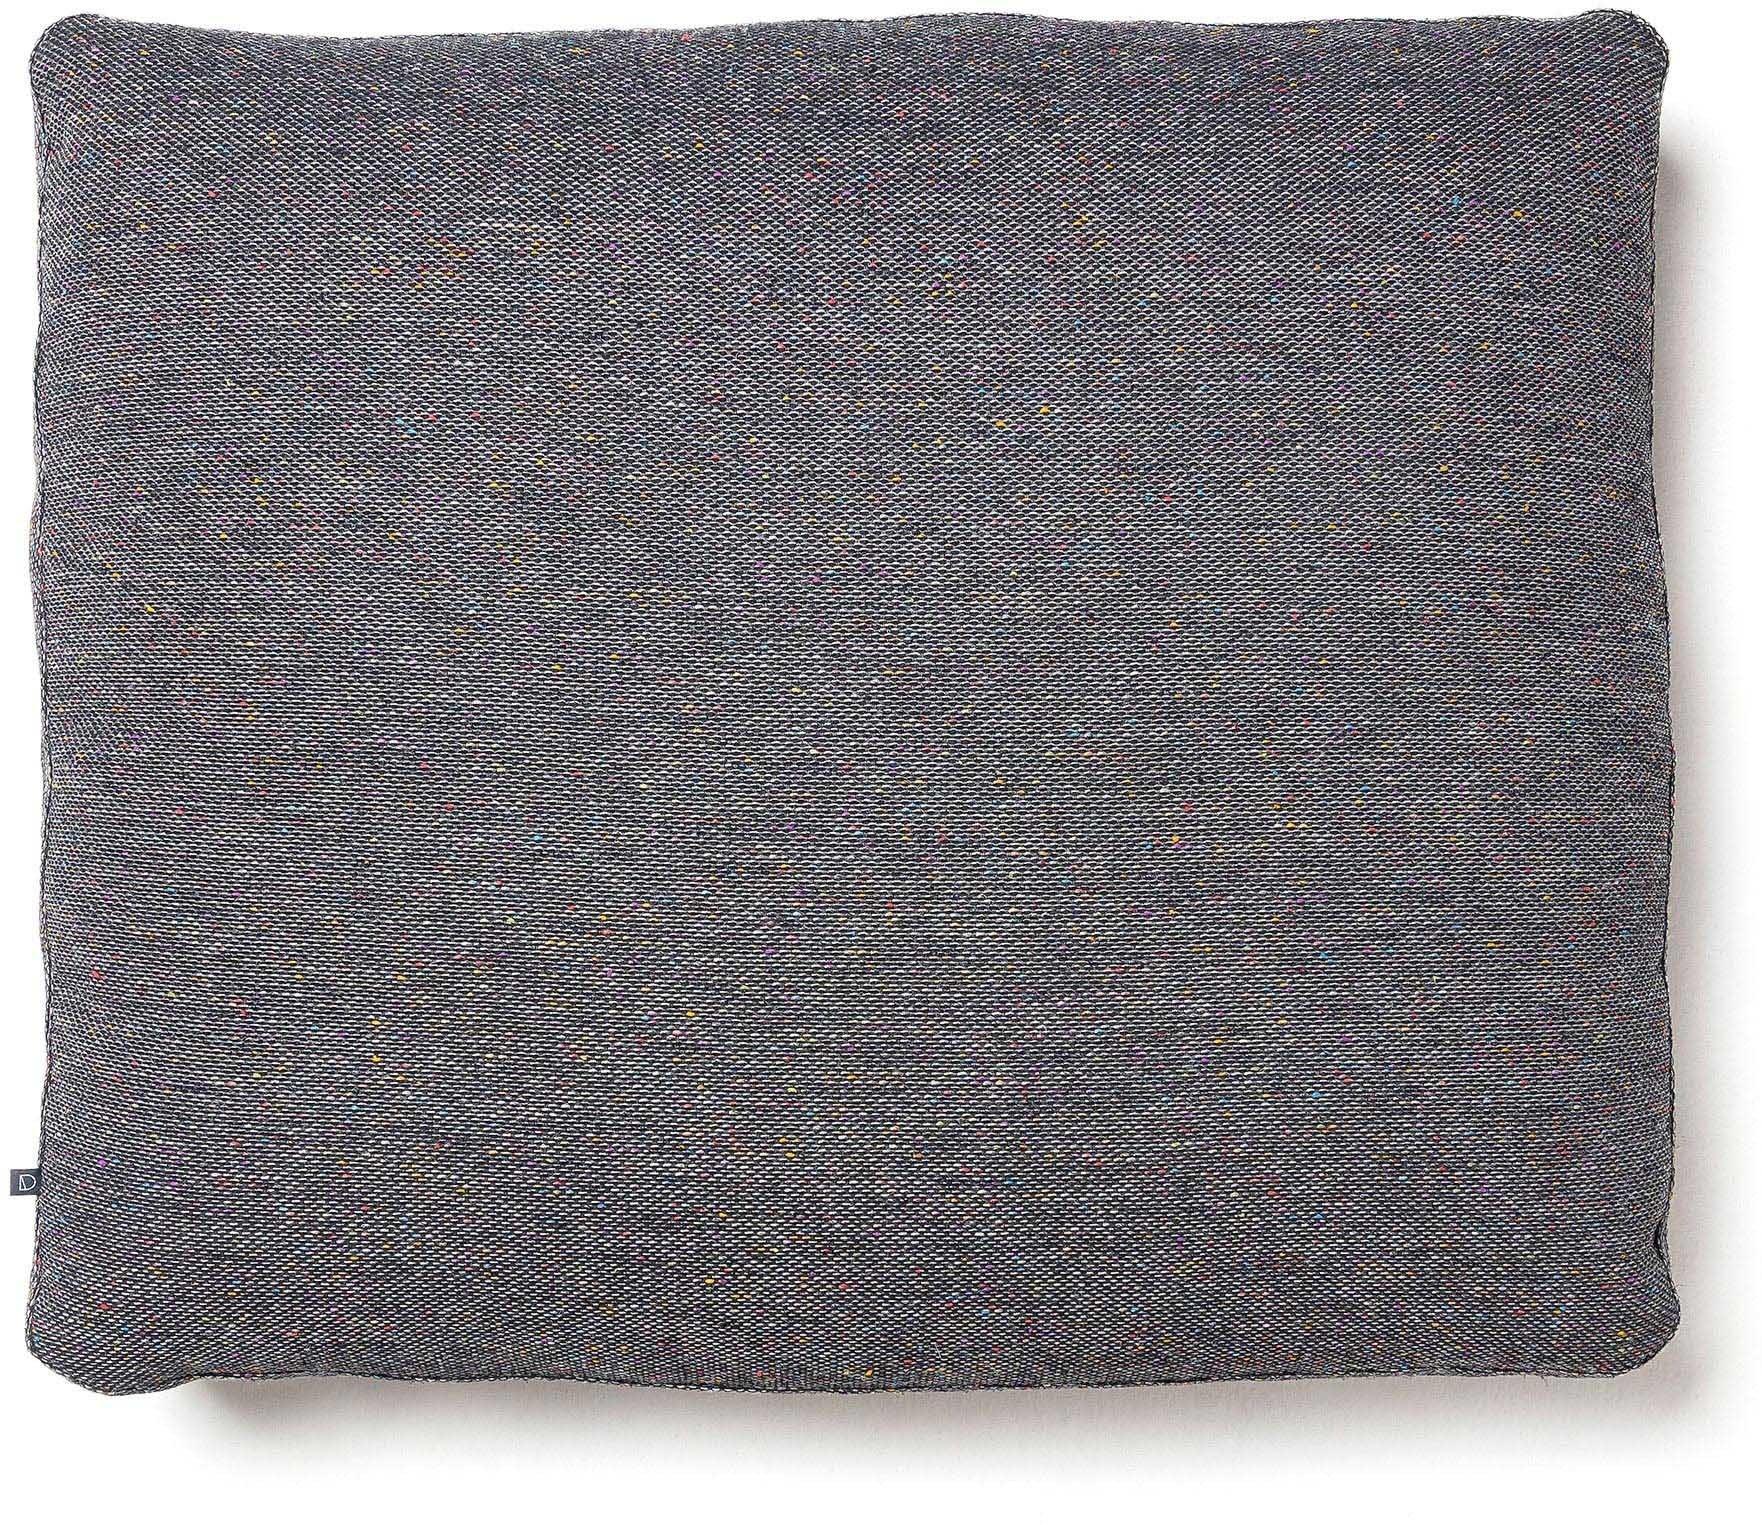 Blok, Sofa tilbehørspude, Stof by LaForma (H: 50 cm. B: 60 cm. L: 15 cm., Lysegrå)